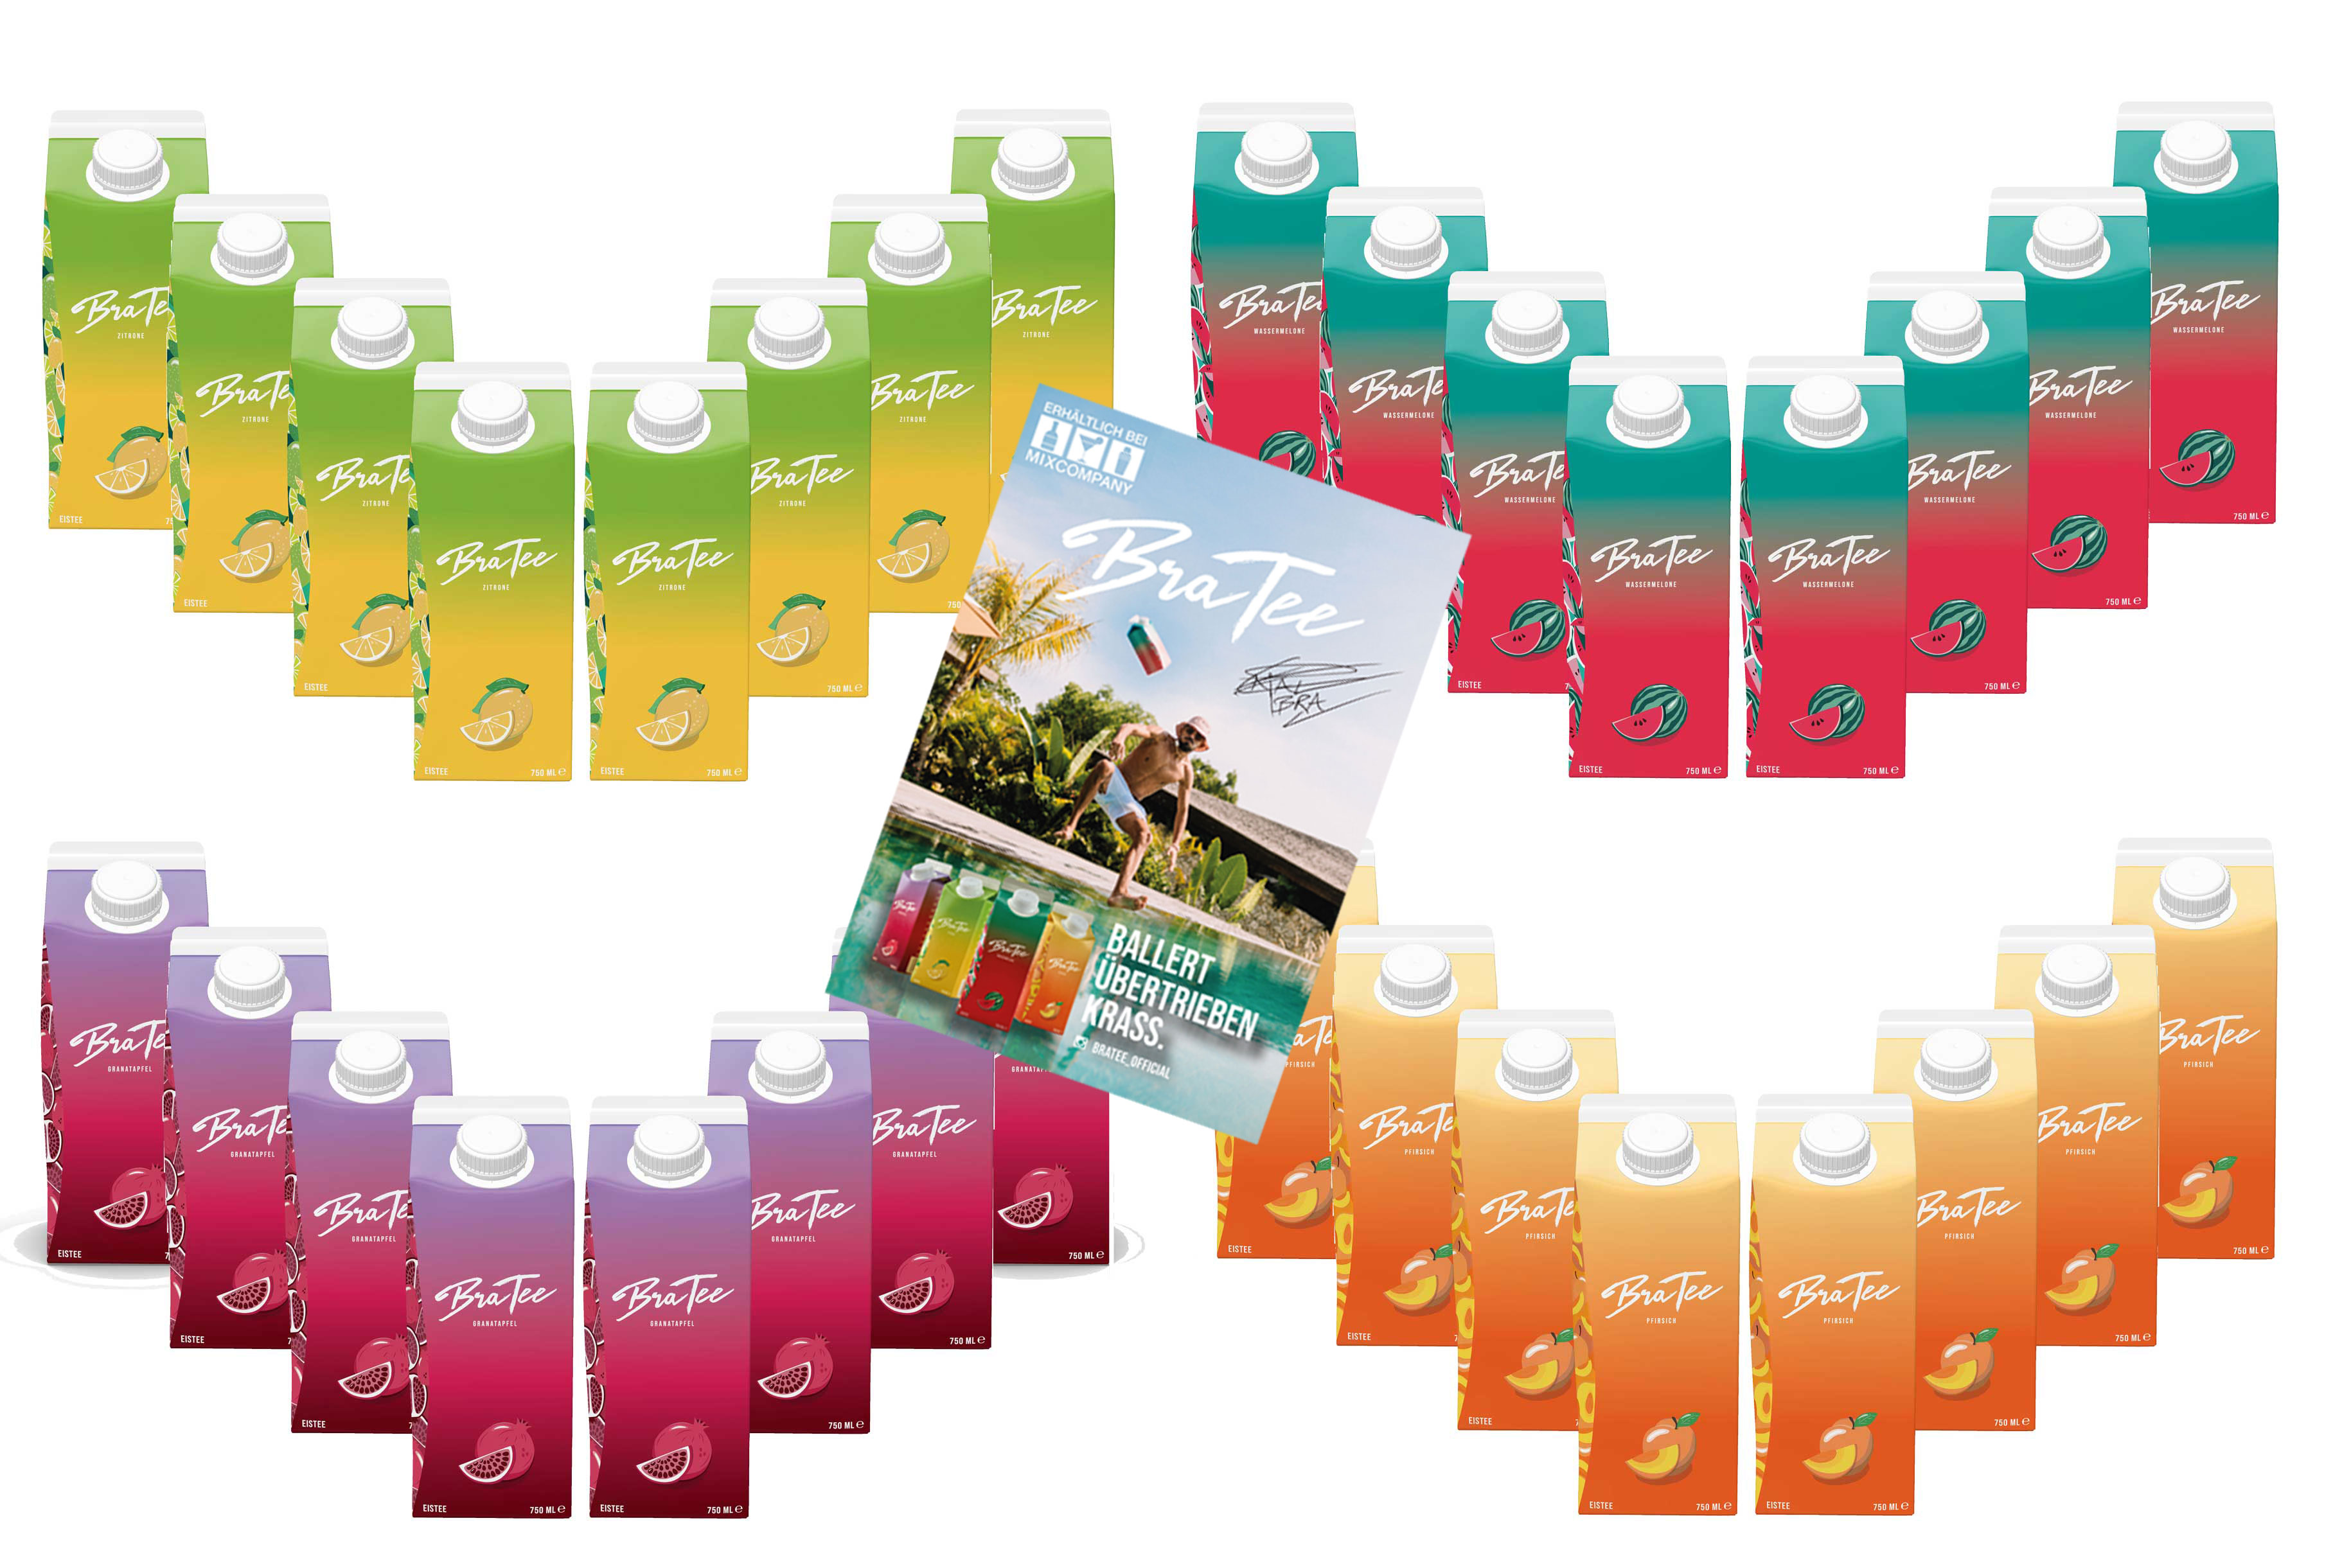 Capital BraTee 32er Tasting Set 8 pro Geschmackssorte Eistee je 750ml mit Autogrammkarte BRATEE Ice tea 8x Wassermelone 8x Zitrone 8x Pfirsich 8x Granatapfel - mit Capi-Qualitäts-Siegel